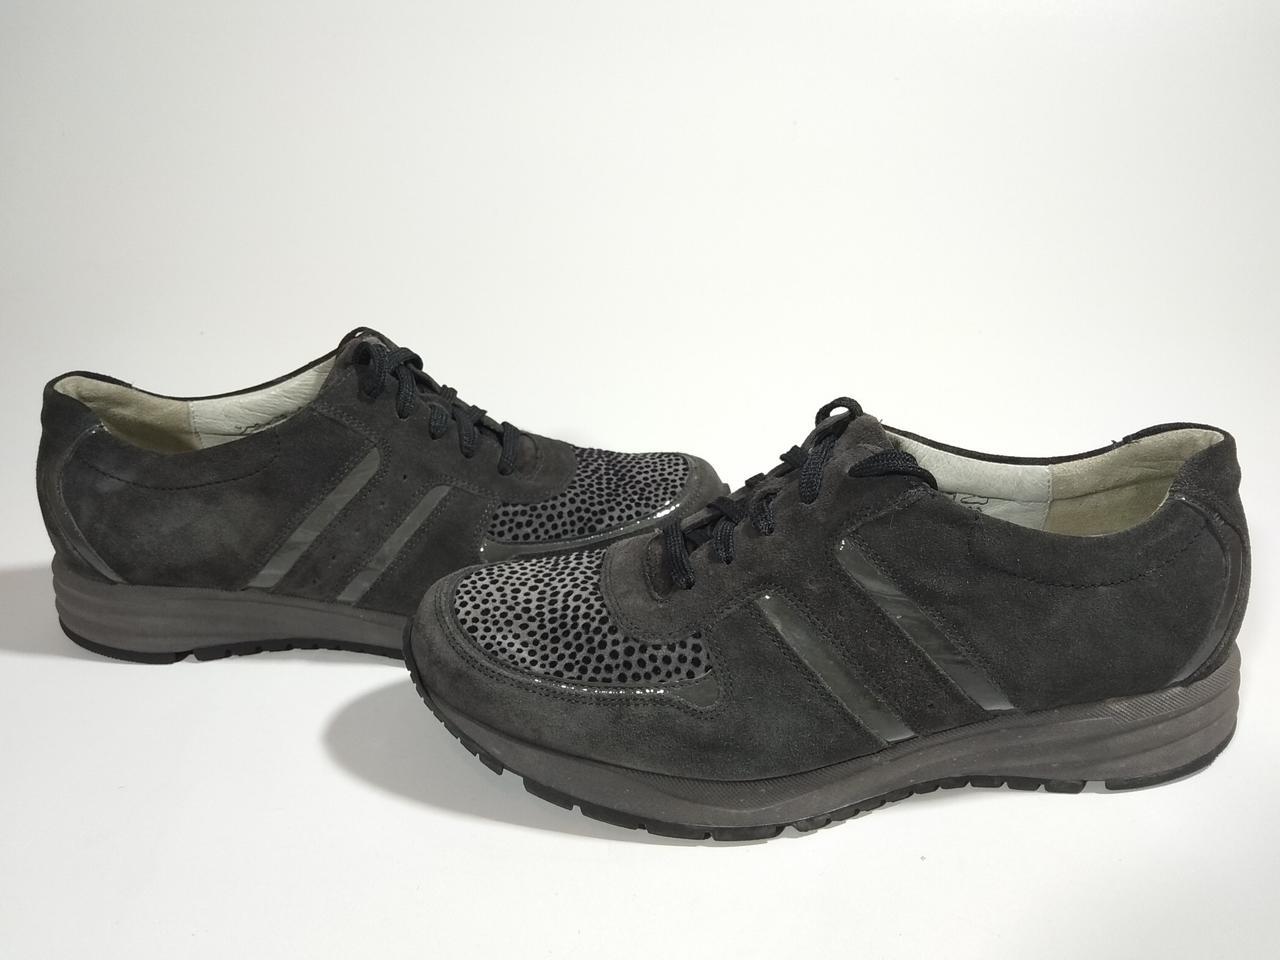 Туфли женские сникерсы  бренд Waldlaufer (Германия) размер 41